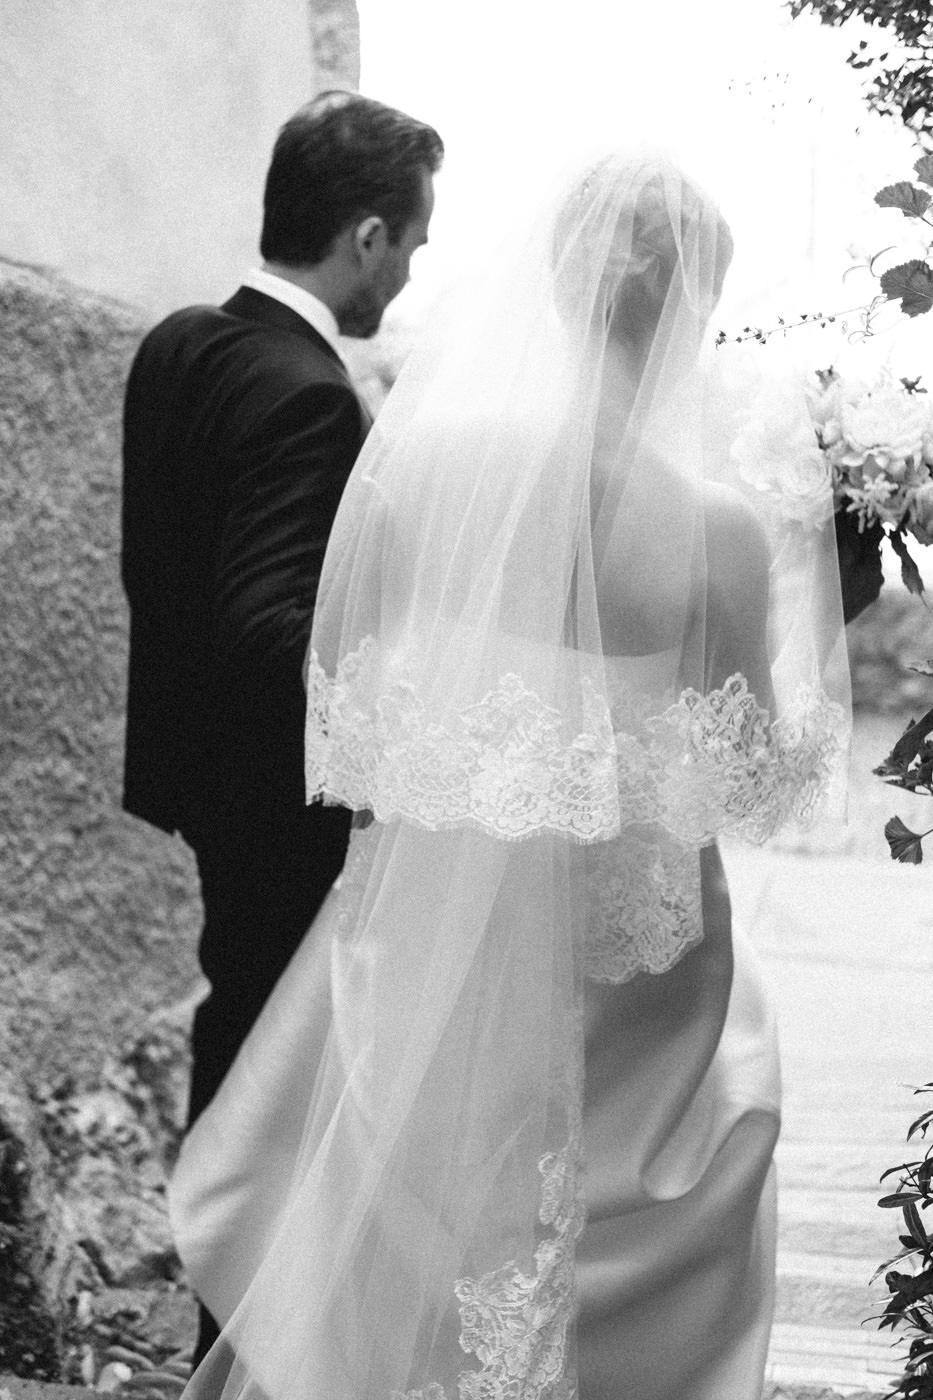 matrimoni_all_italiana_fotografo_matrimonio_cinque_terre-39.jpg